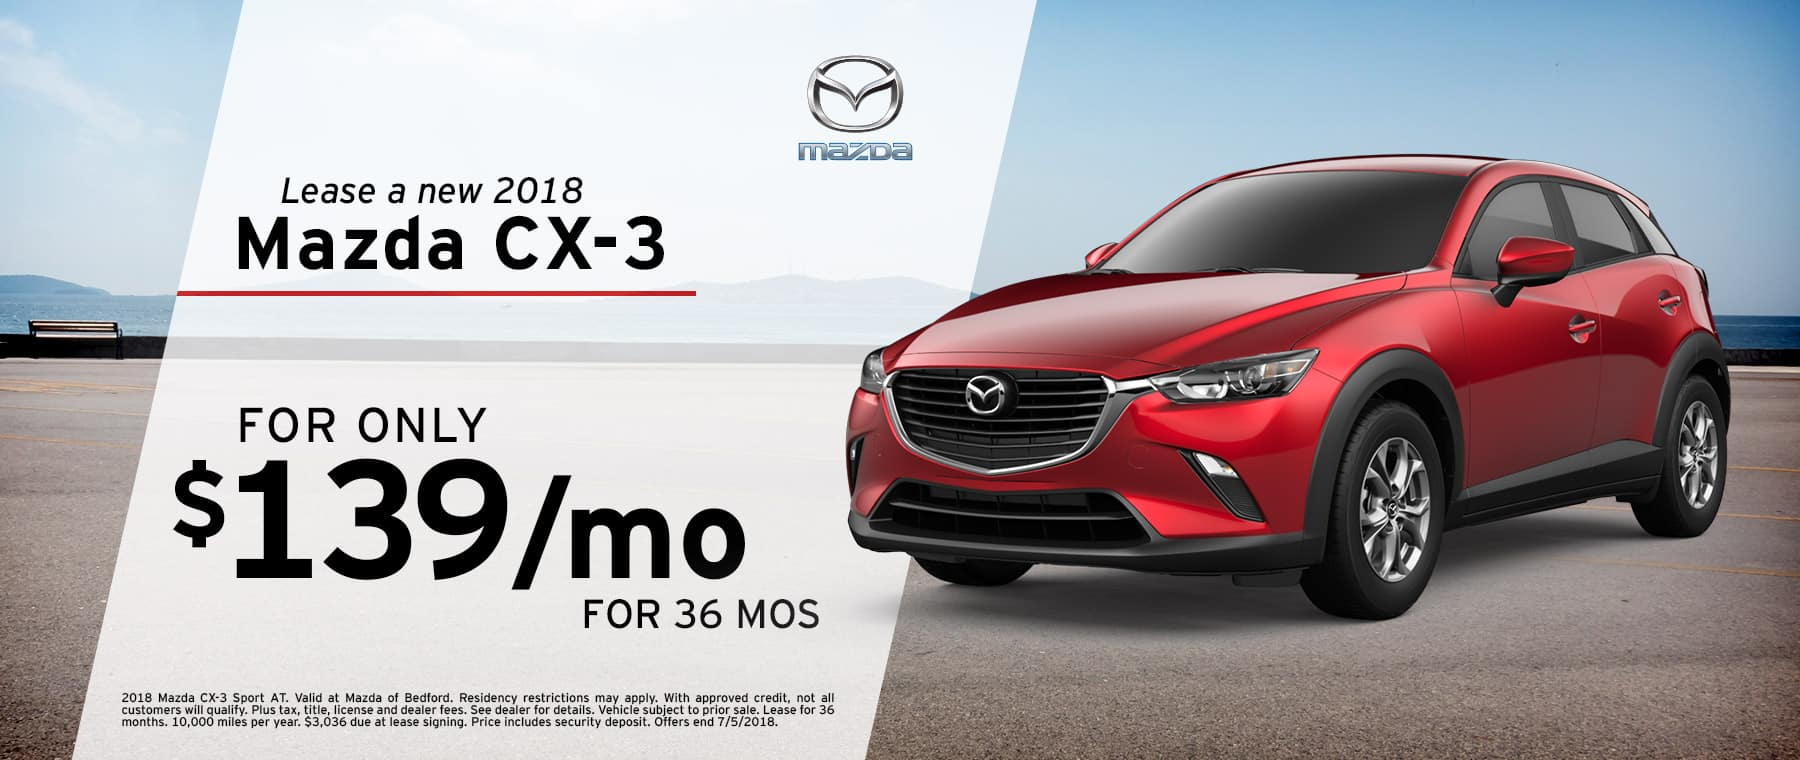 Mazda Bedford Specials | Mazda CX-3